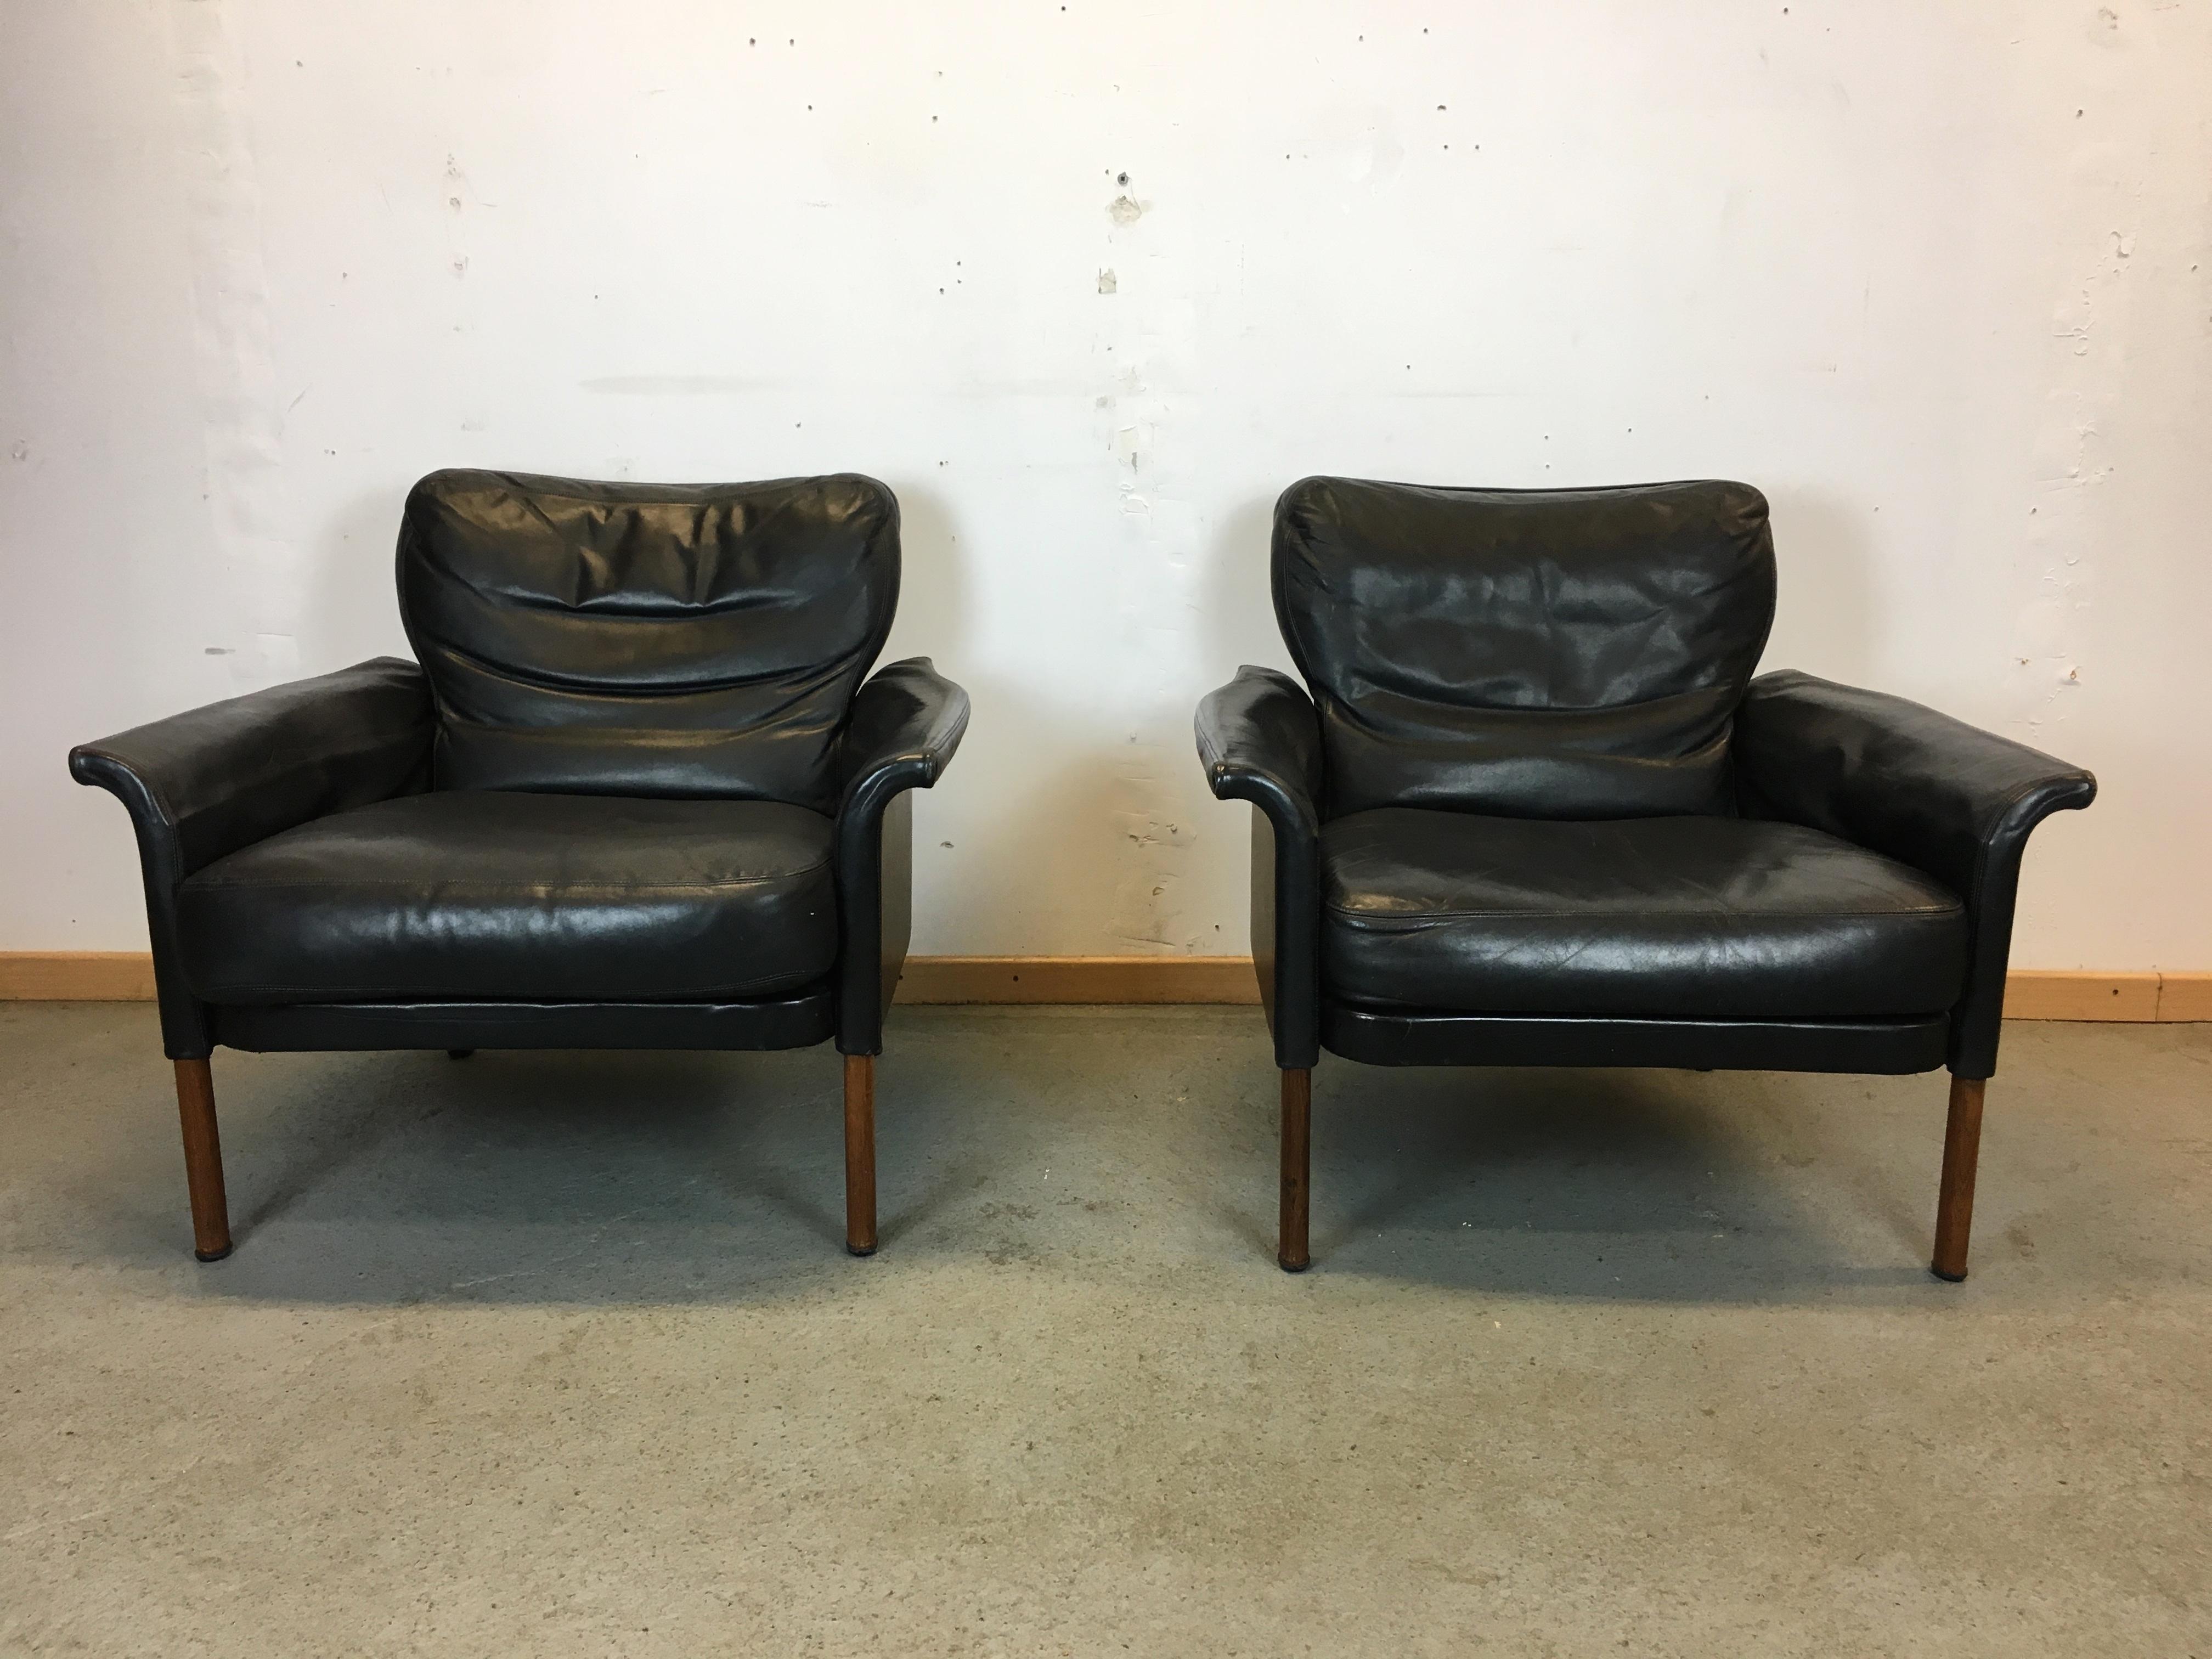 Paire fauteuils scandinave cuir année 60 Pair Chairs Leather Danish